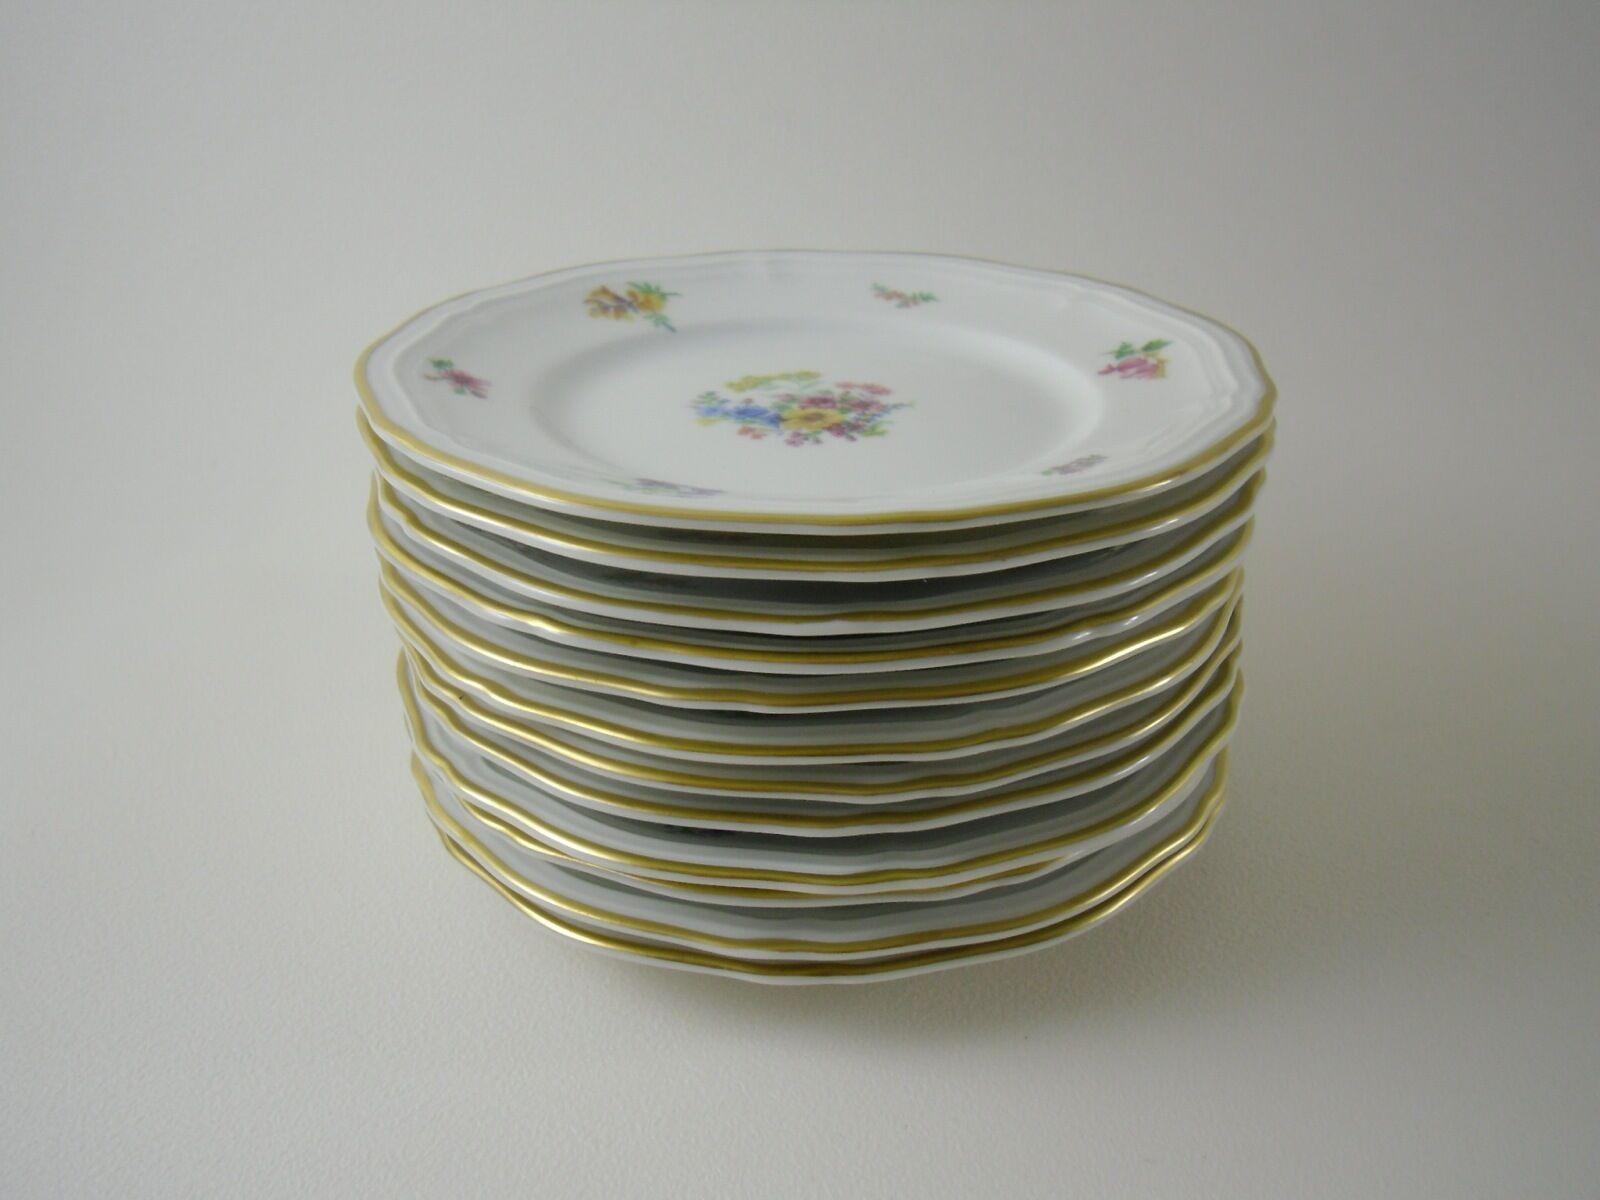 Rosenthal Porcelaine 12 x BrougeTELLER assiette 15,5 cm 2365 fleurs monture en or